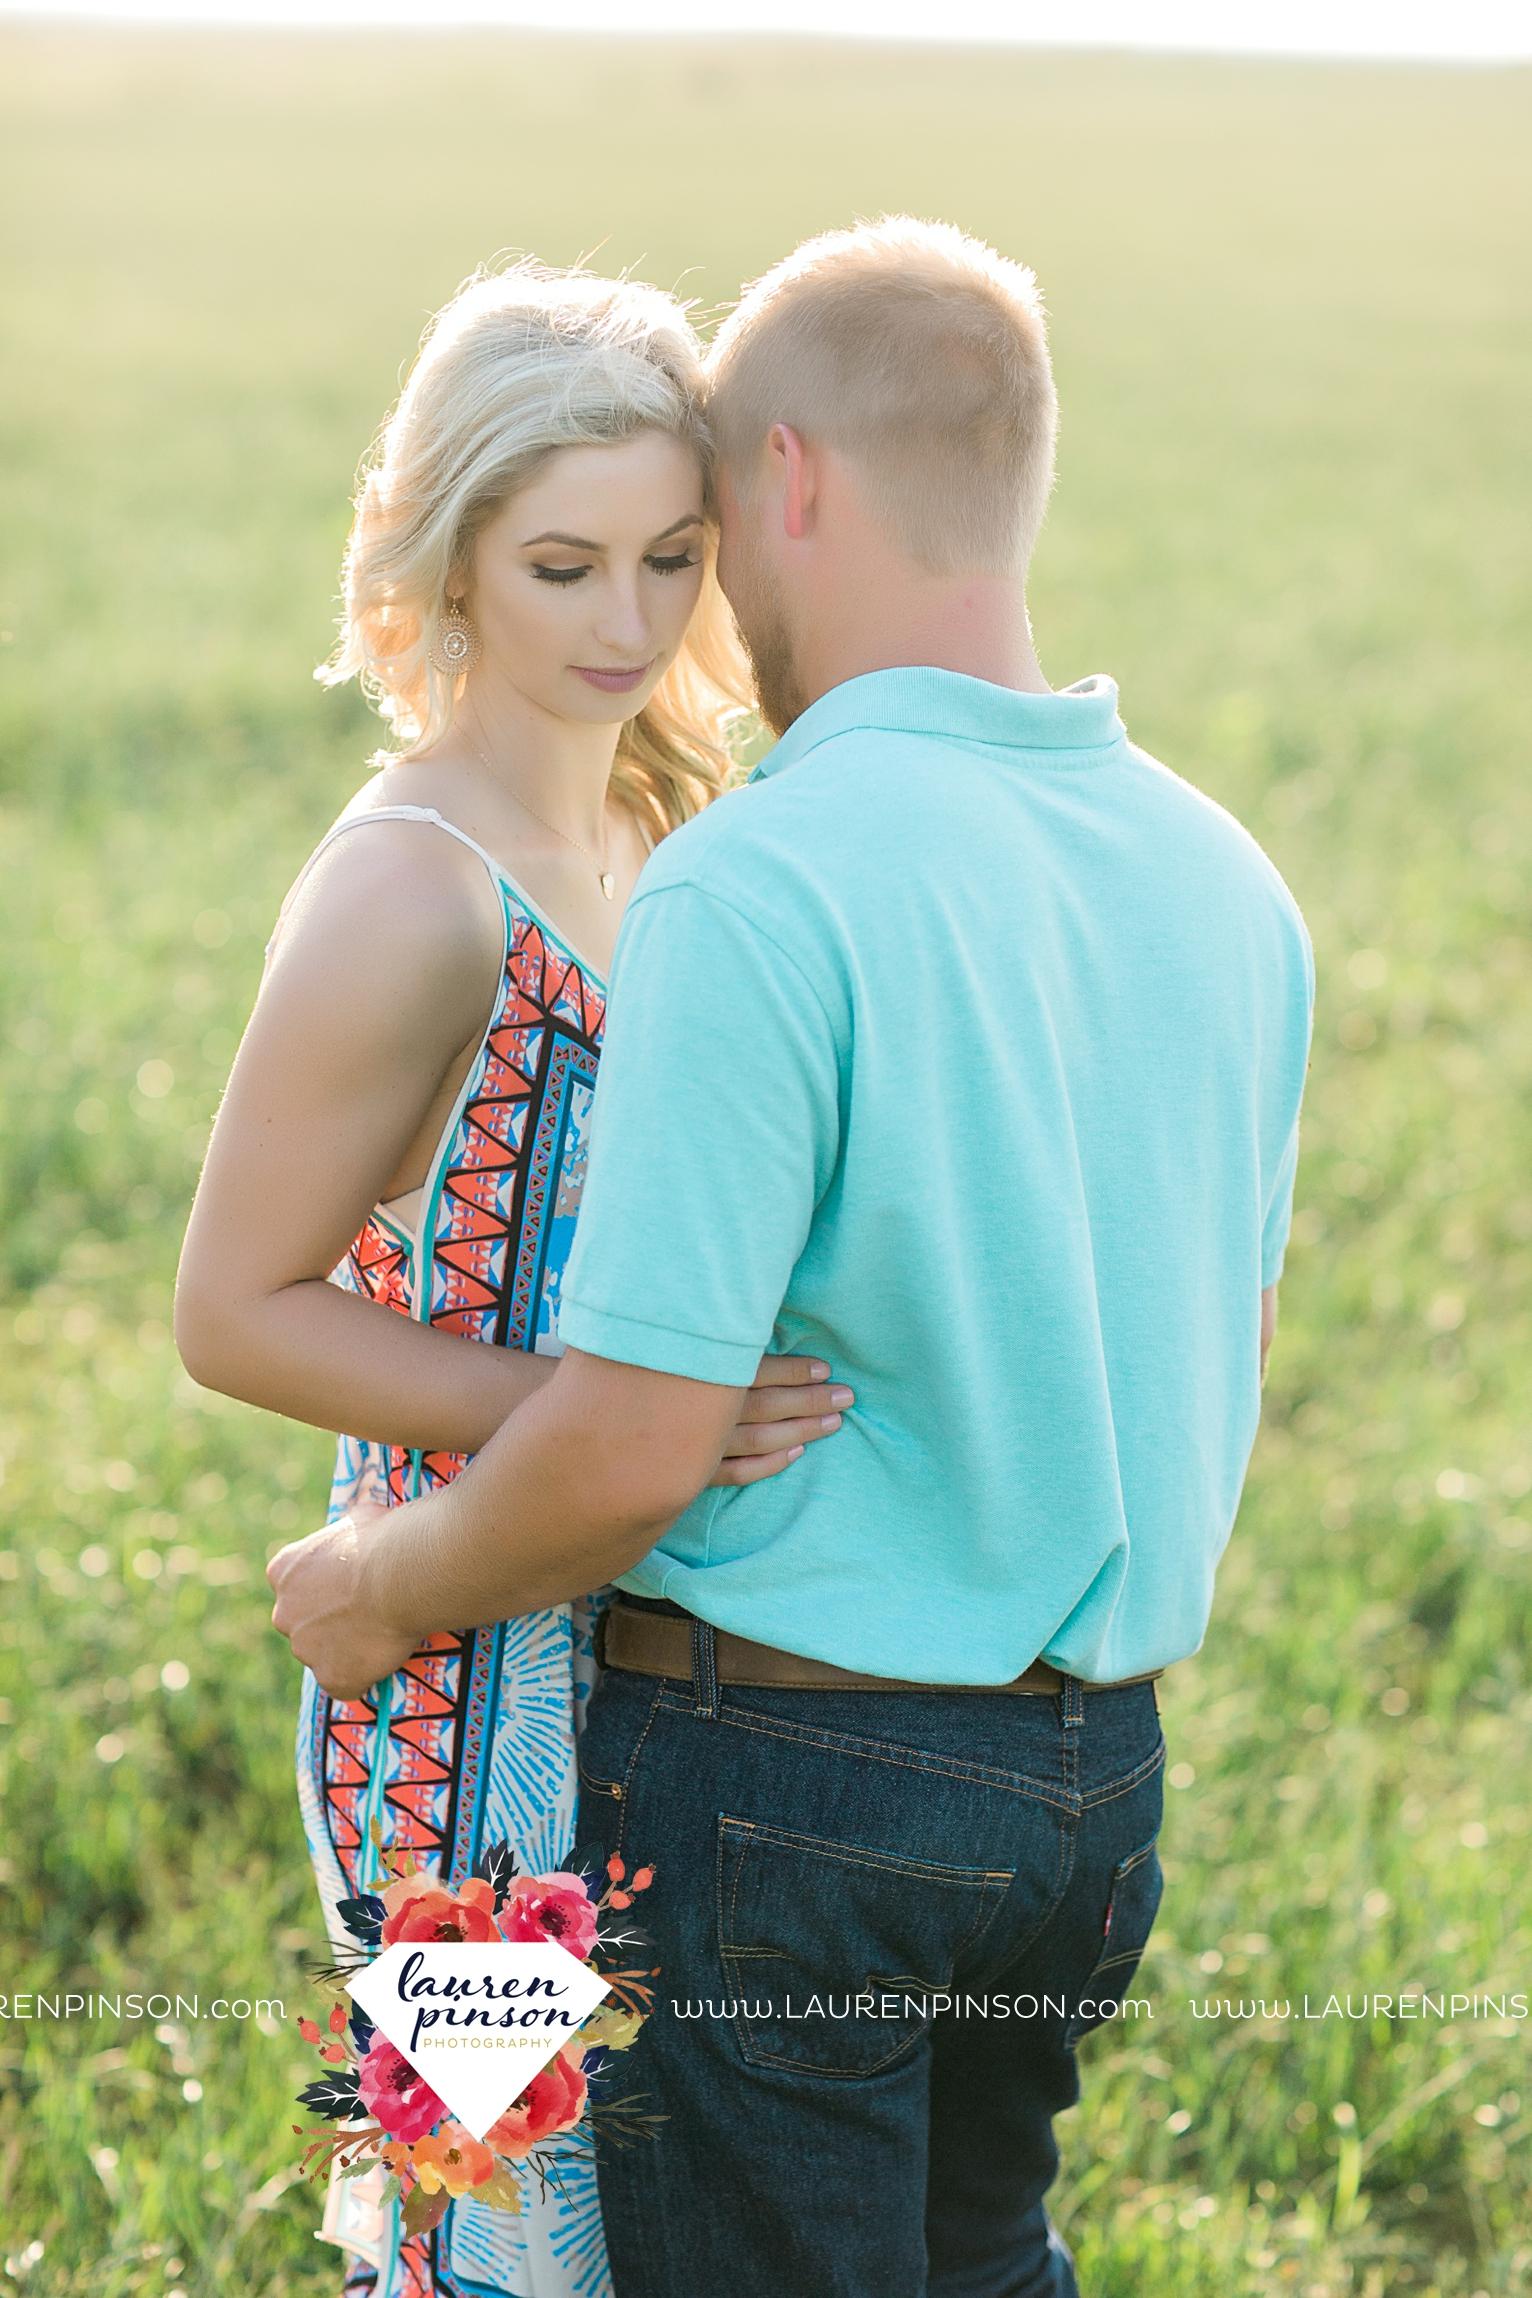 wichita-falls-texas-wedding-photographer-scotland-texas-engagement-session-country-barn-field-windthorst_2744.jpg